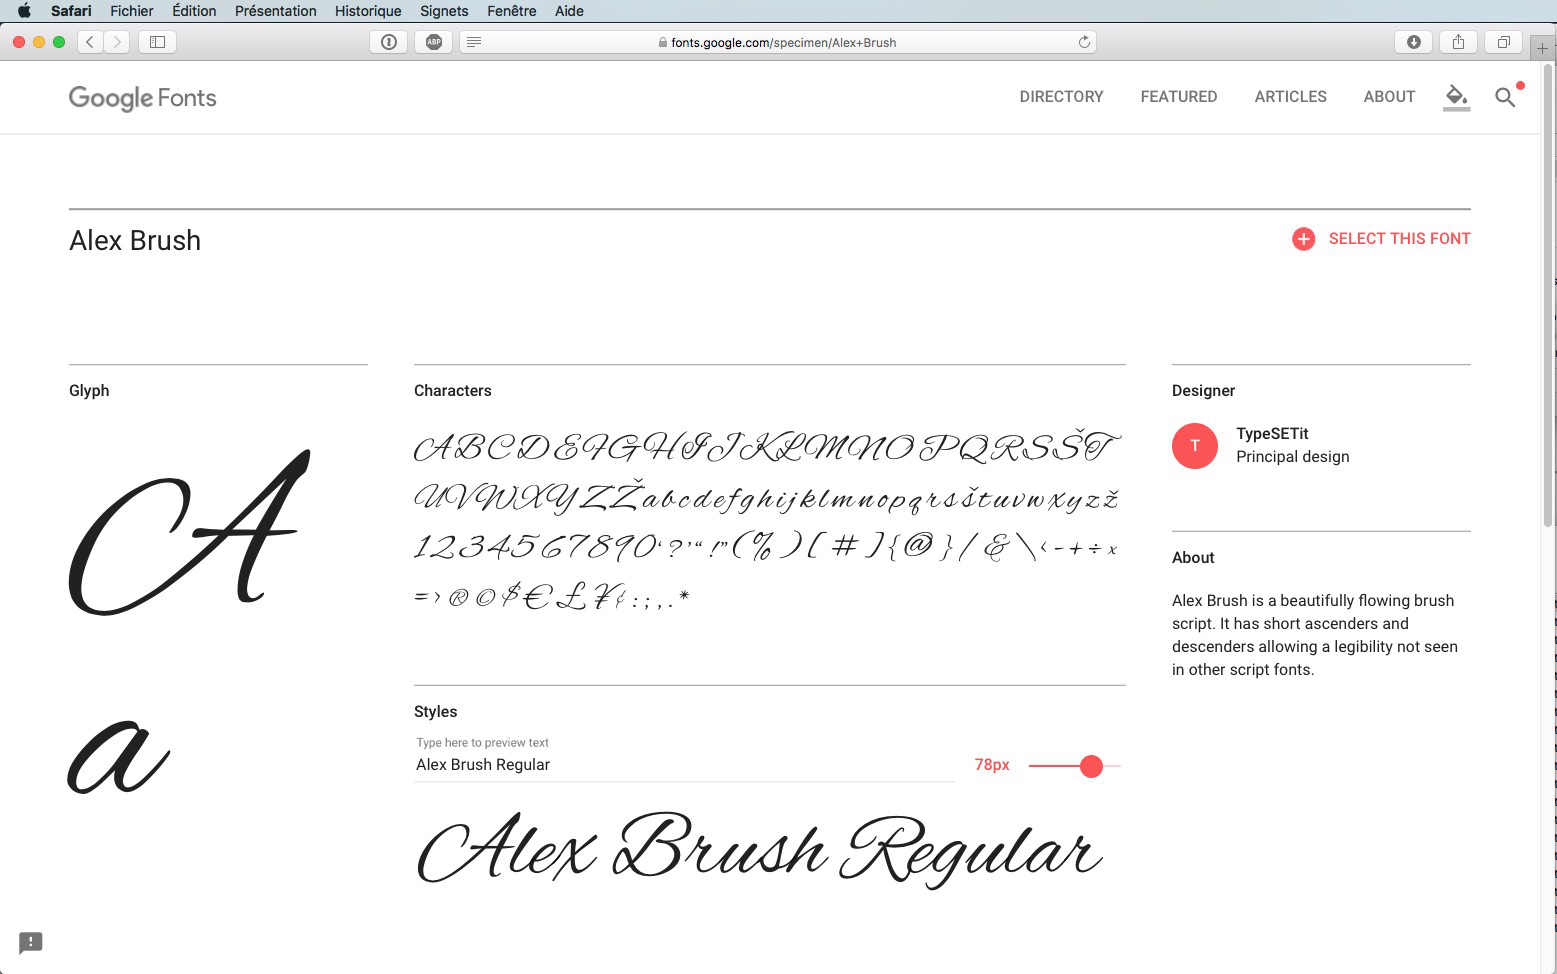 Script-Font Alex Brush Regular